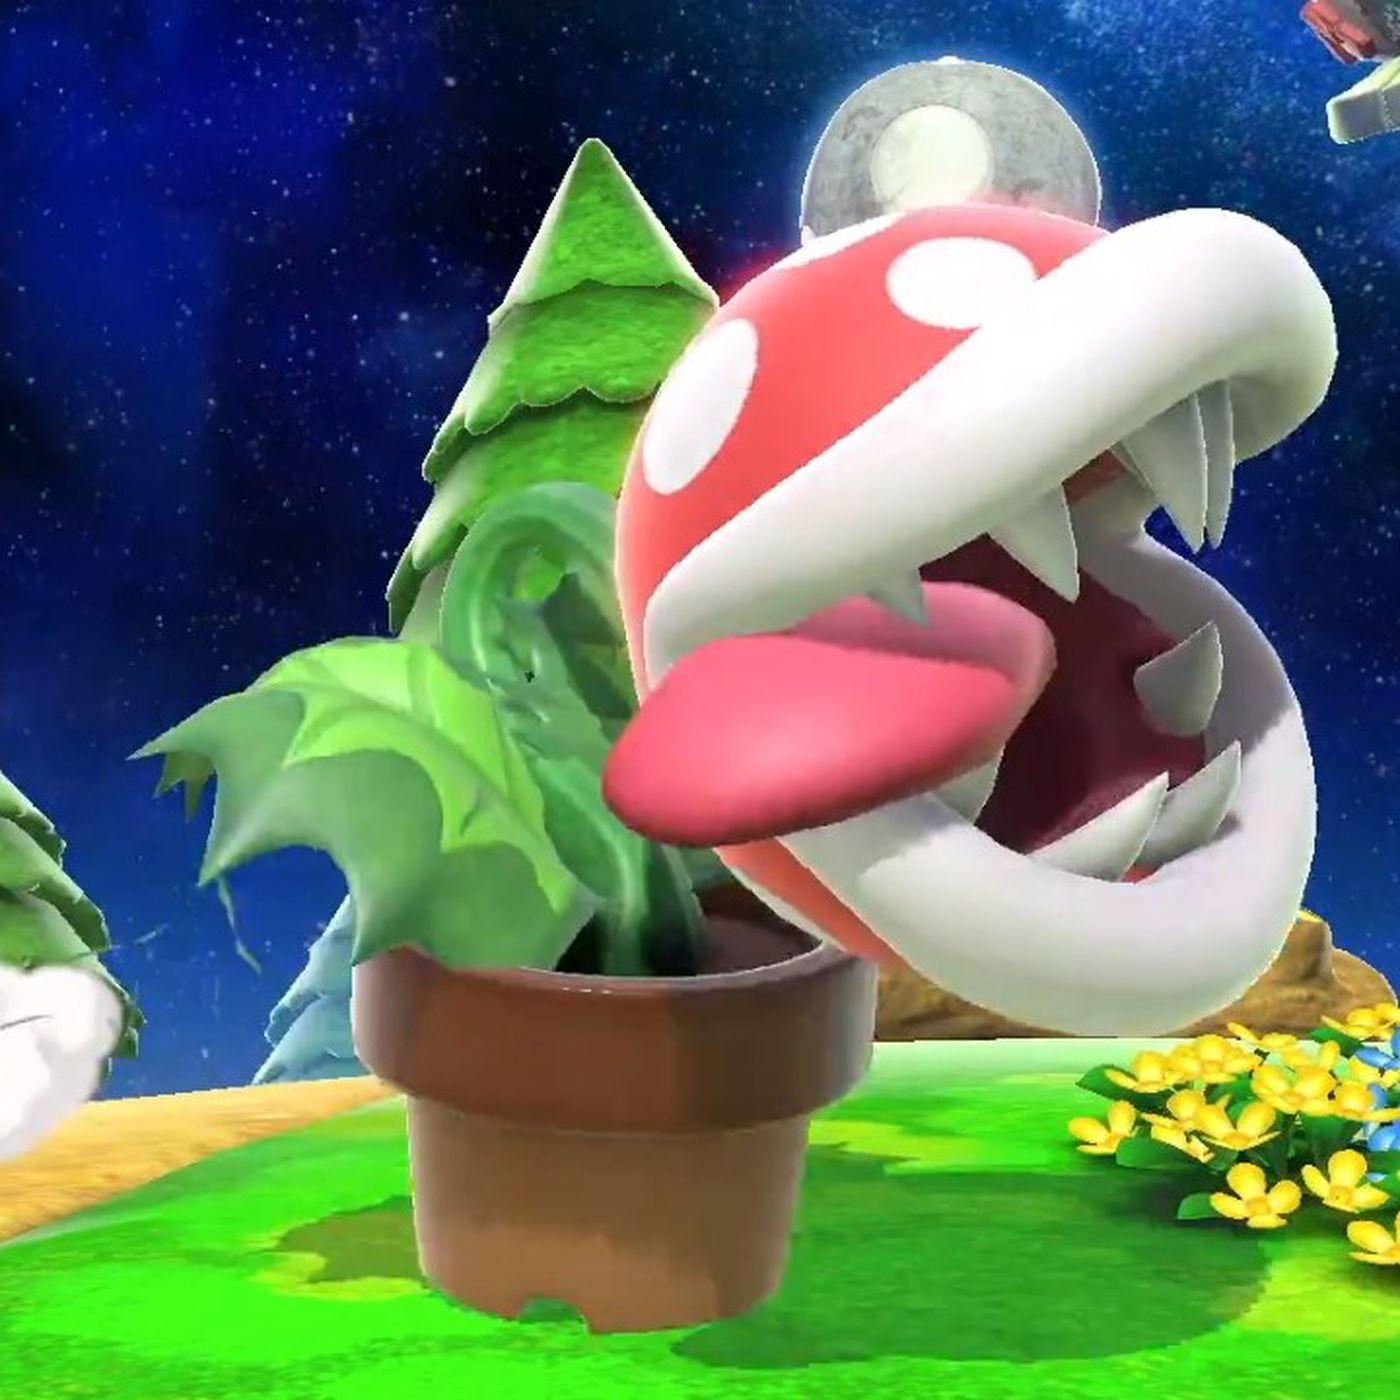 How to download Piranha Plant DLC for Super Smash Bros  Ultimate